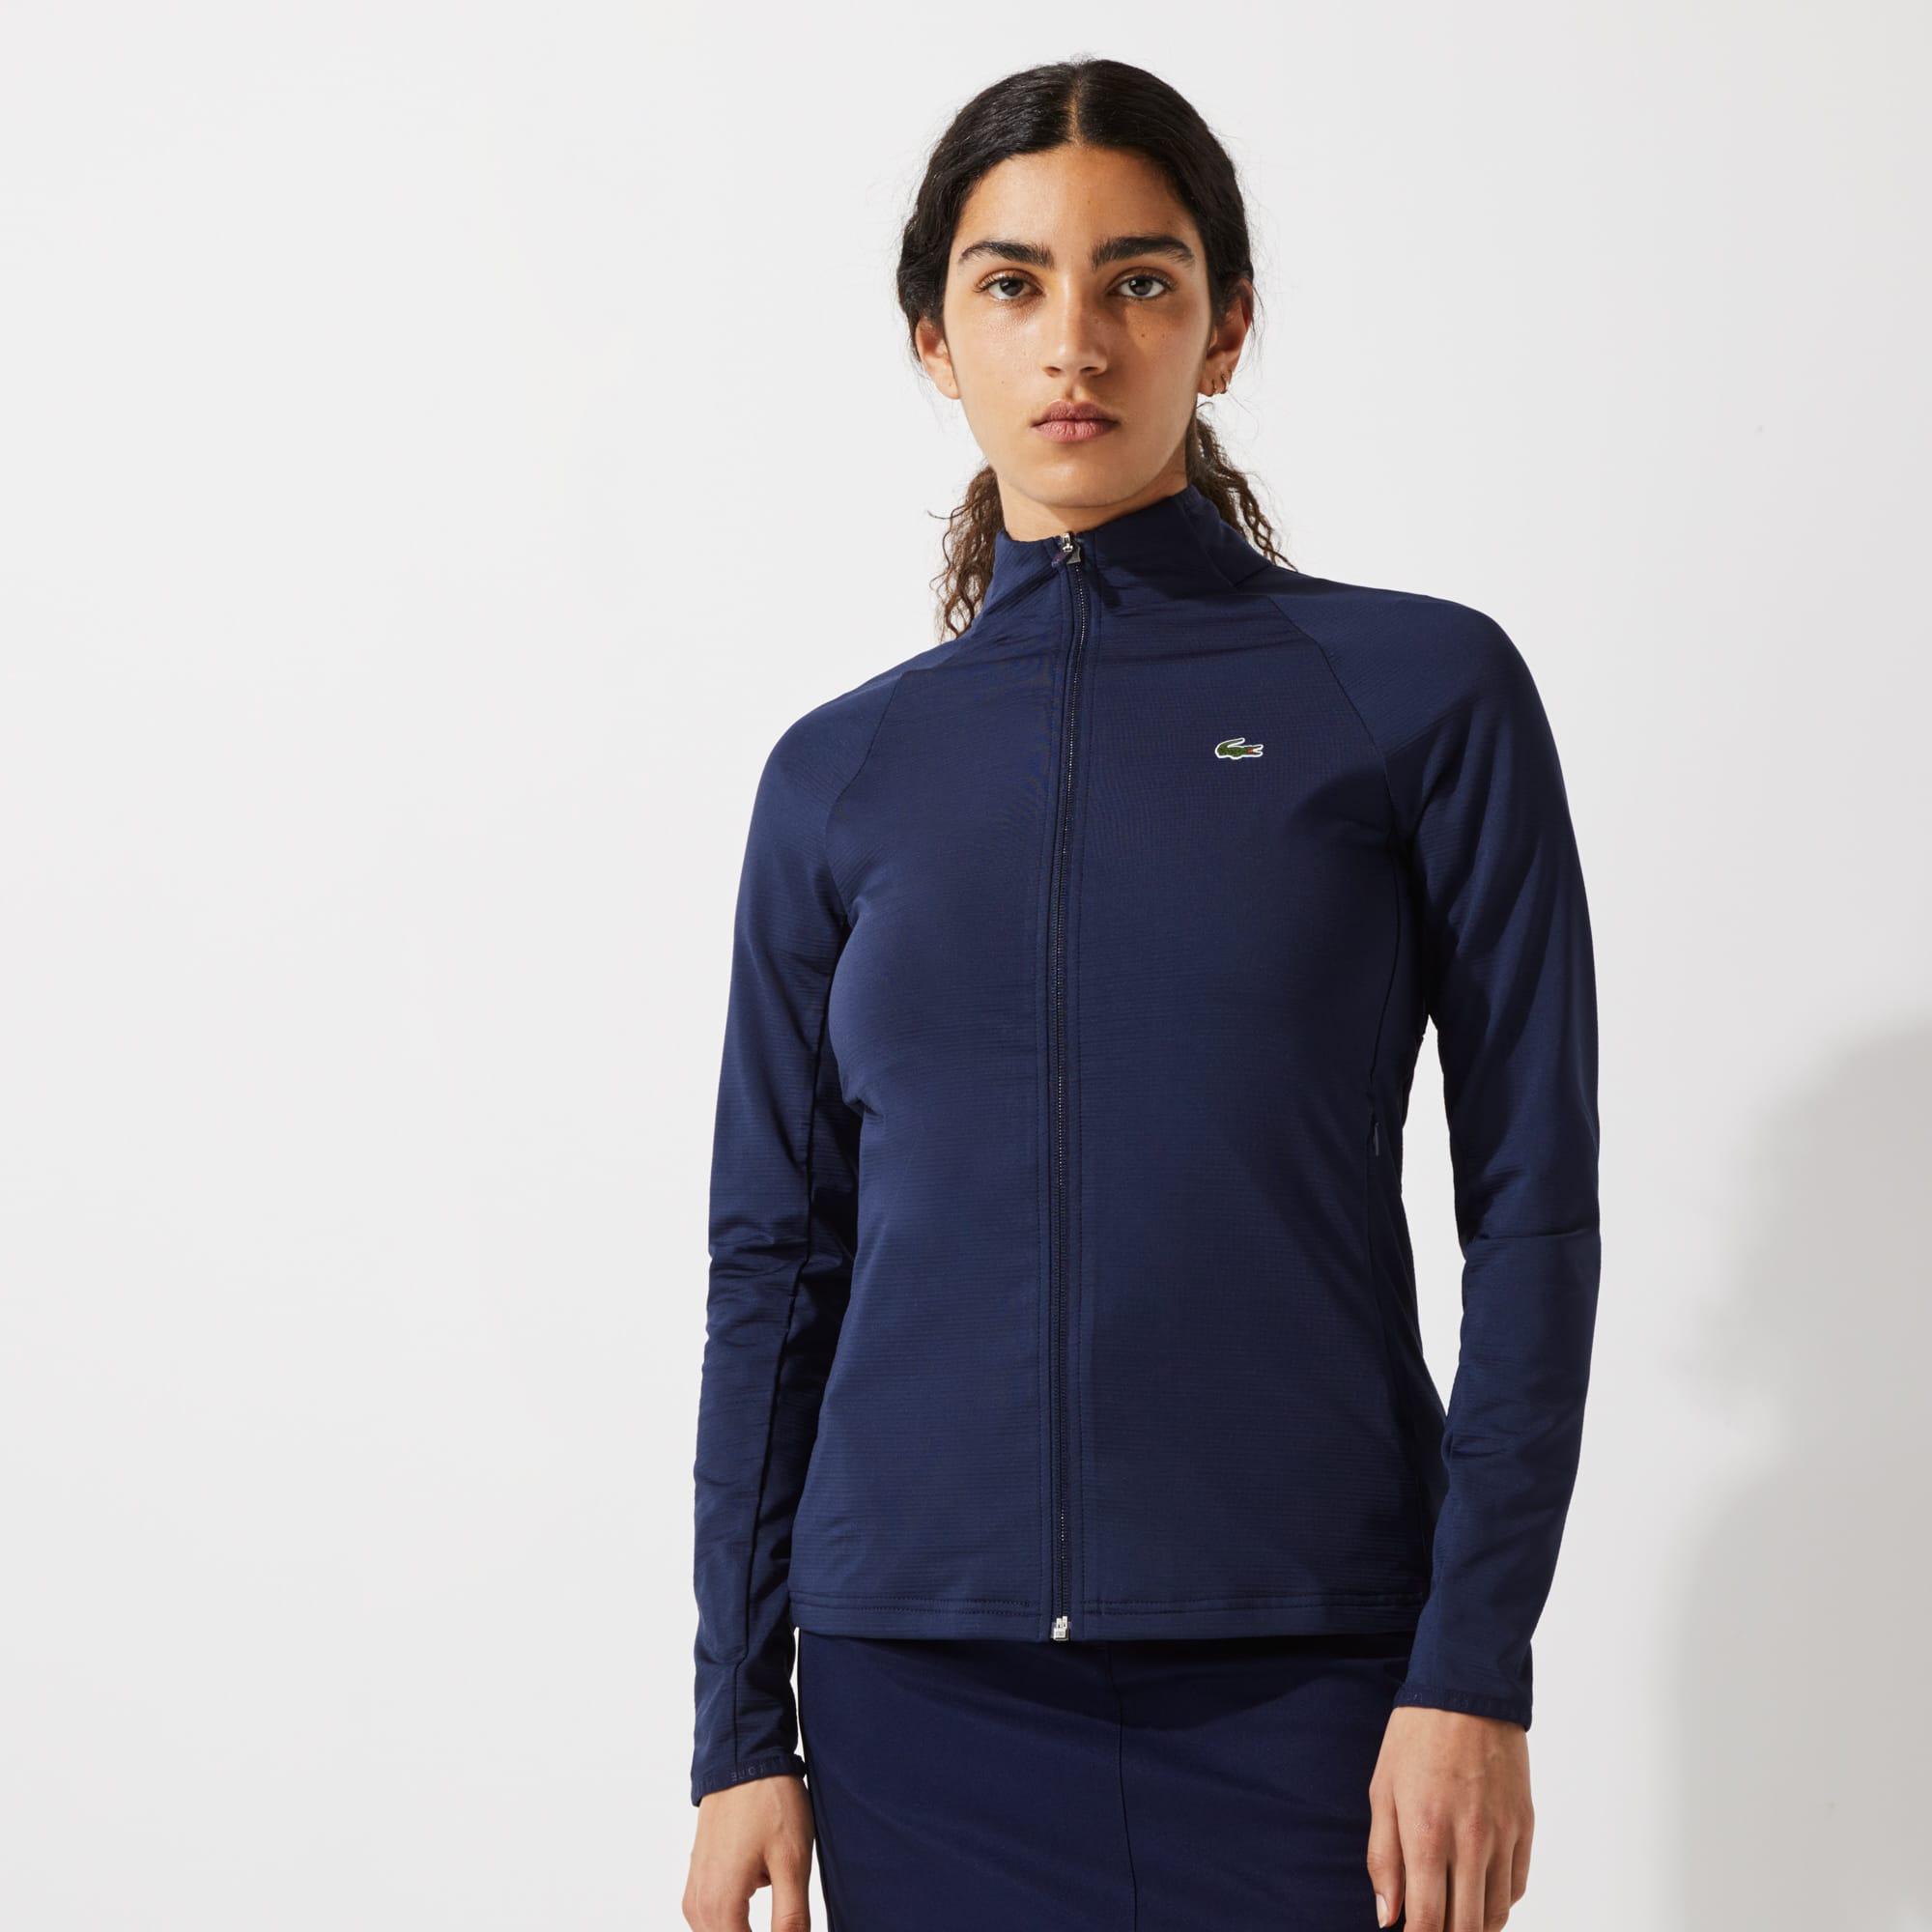 Lacoste Mens SPORT Breathable Ergonomic Zip Golf Jacket